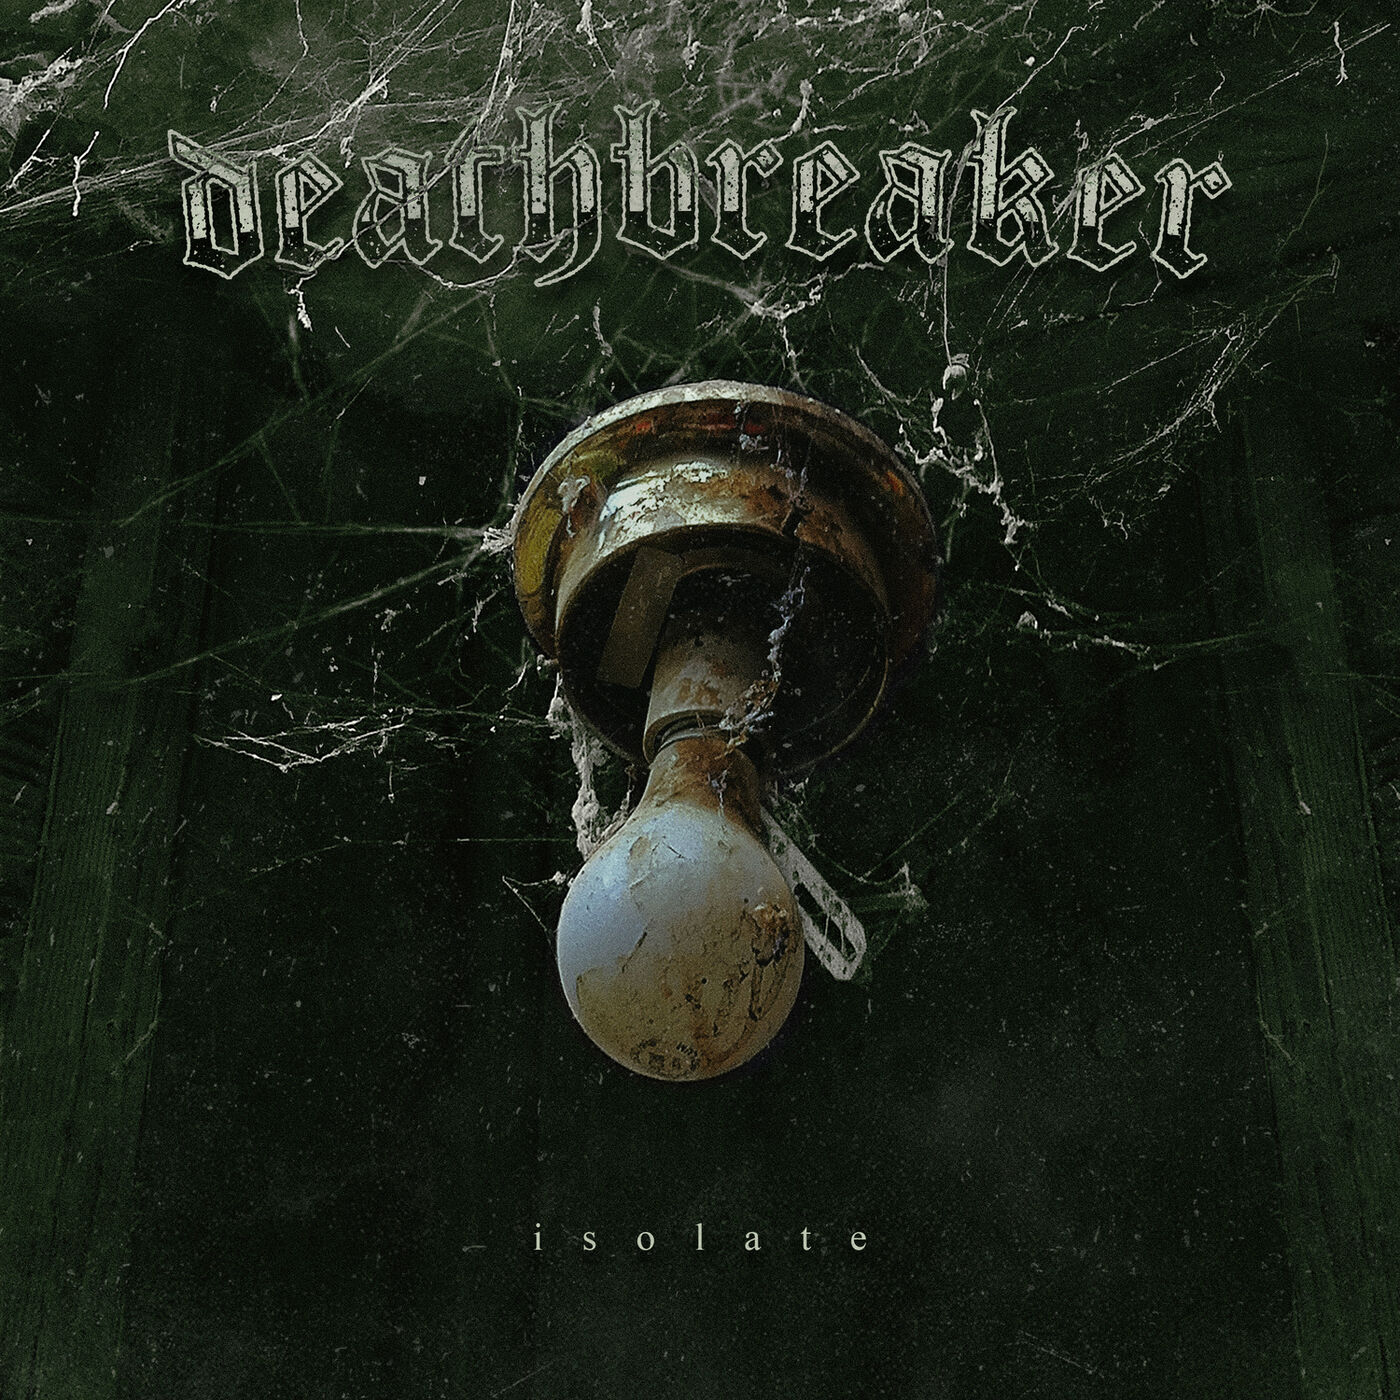 Deathbreaker - Isolate (2020)